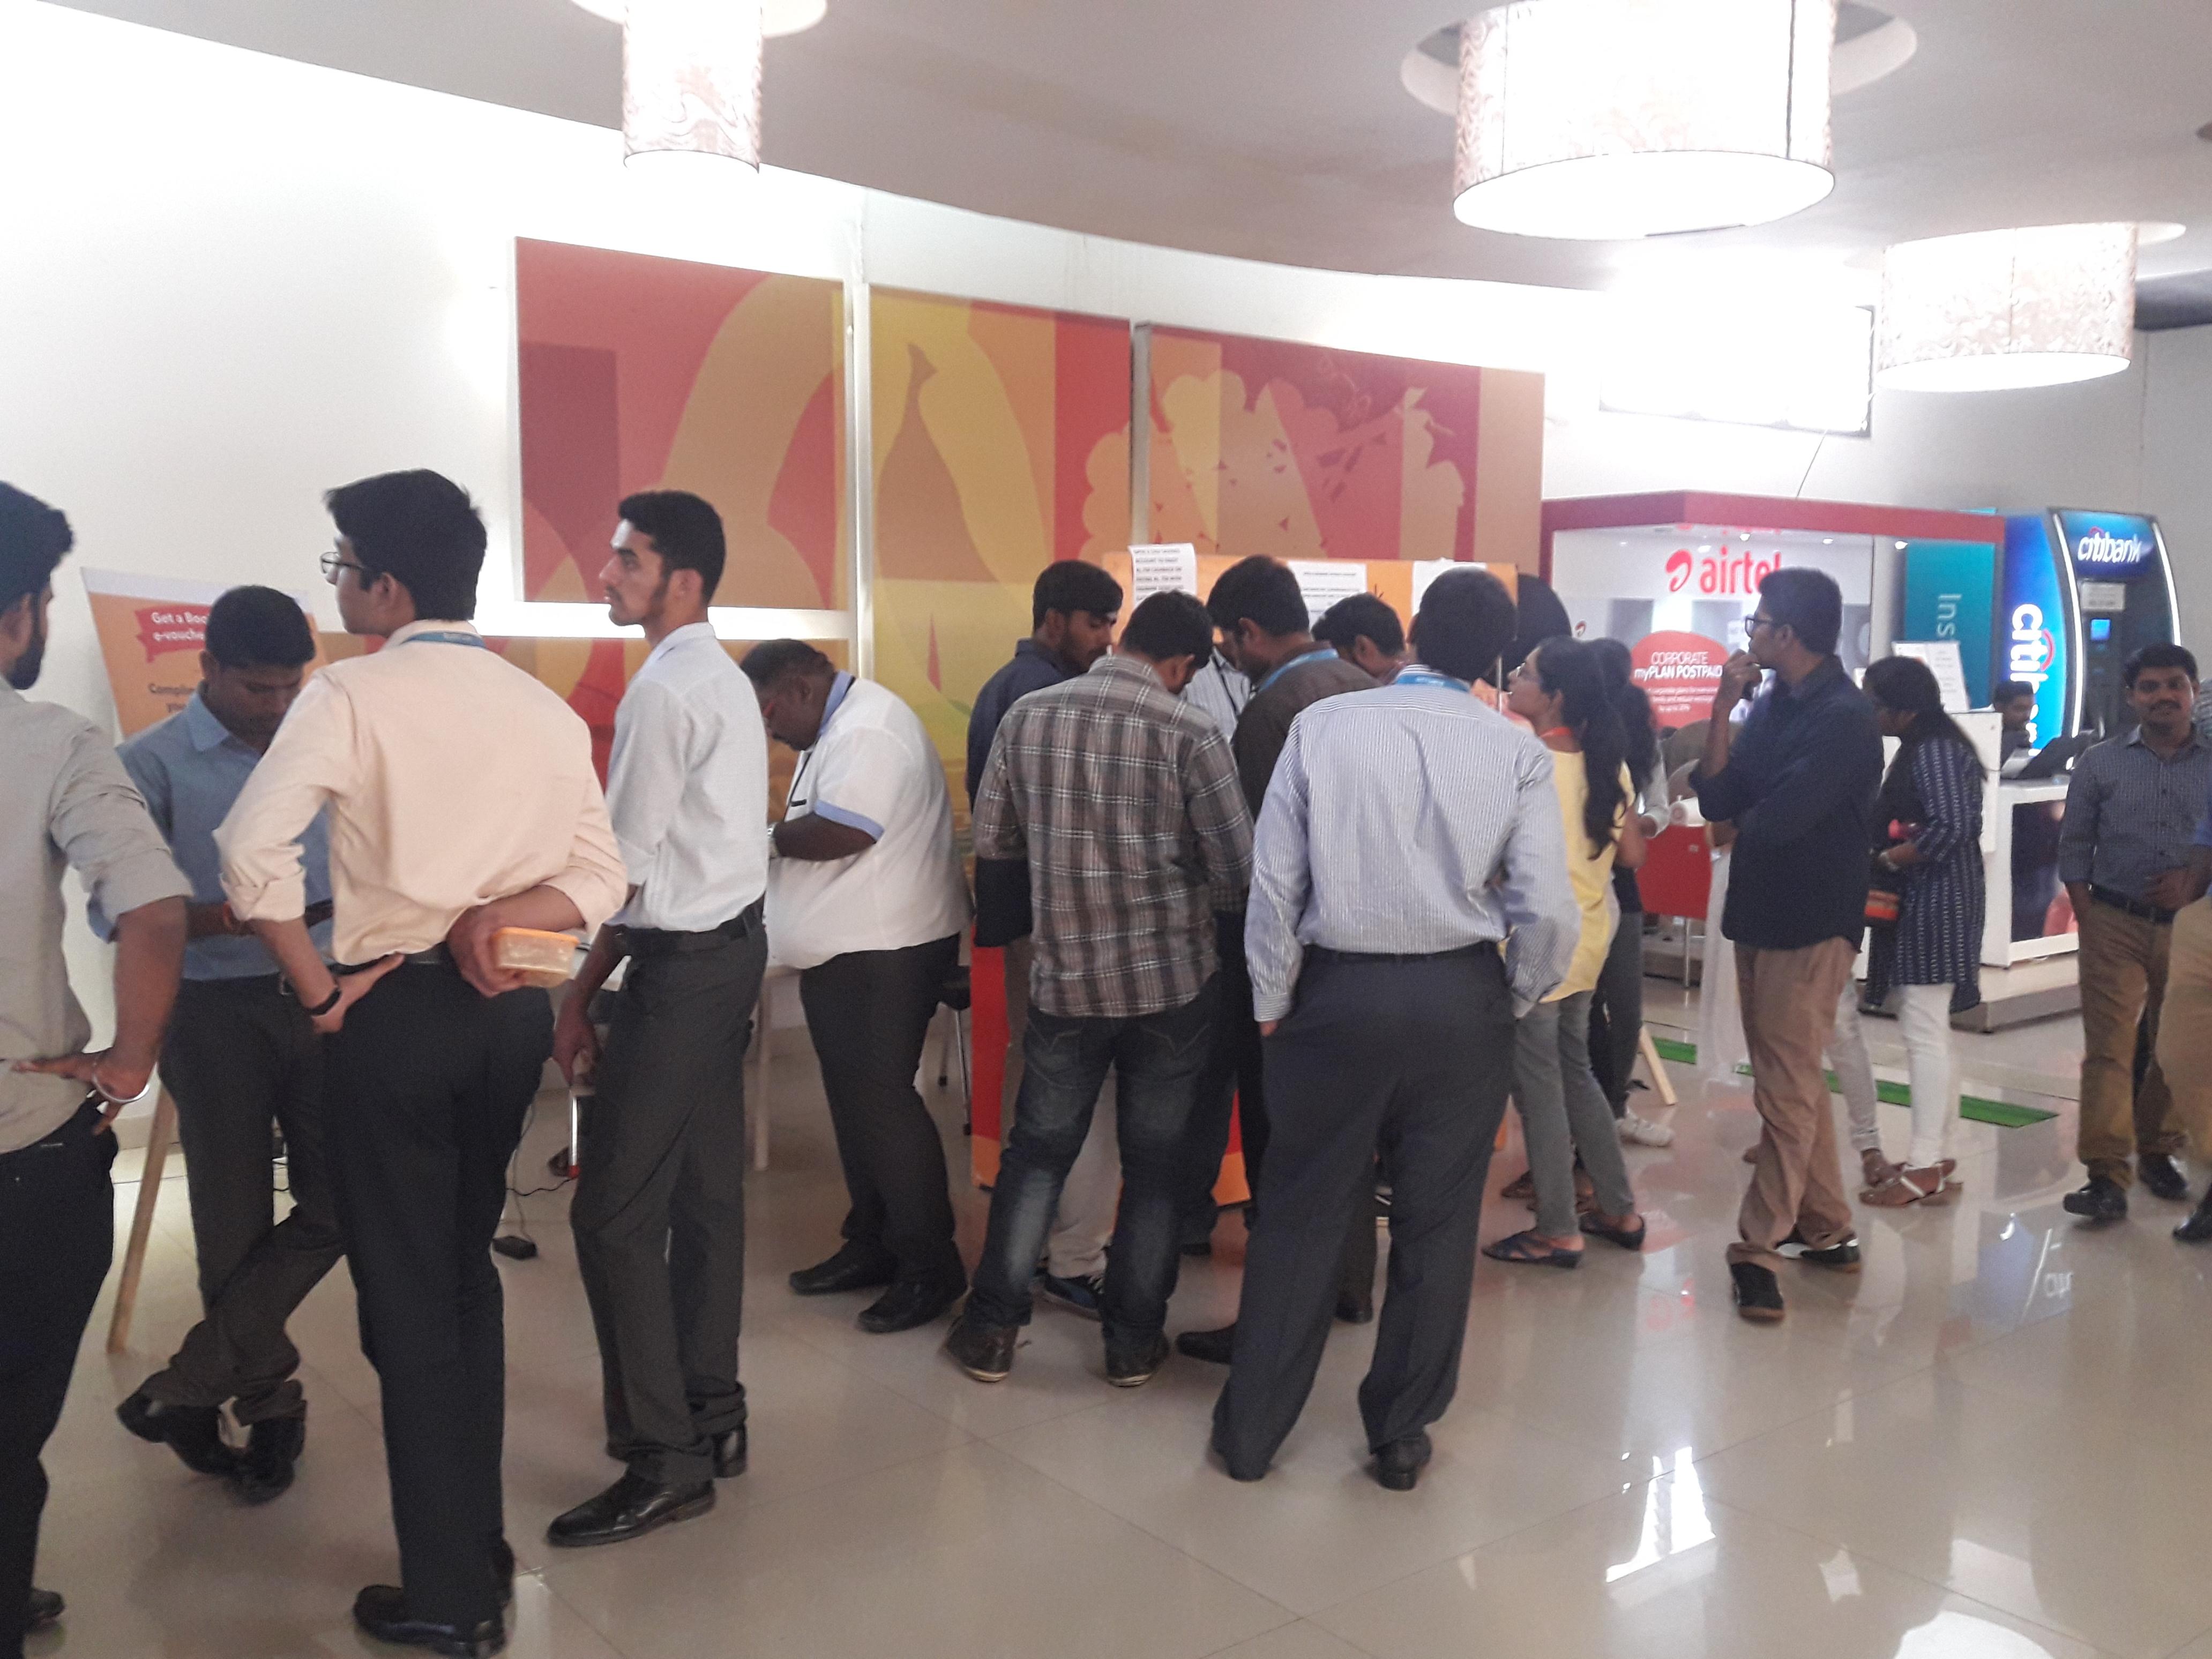 ITPL IT Park,Whitefield, Bangalore - Kiosk Advertising Option - 1